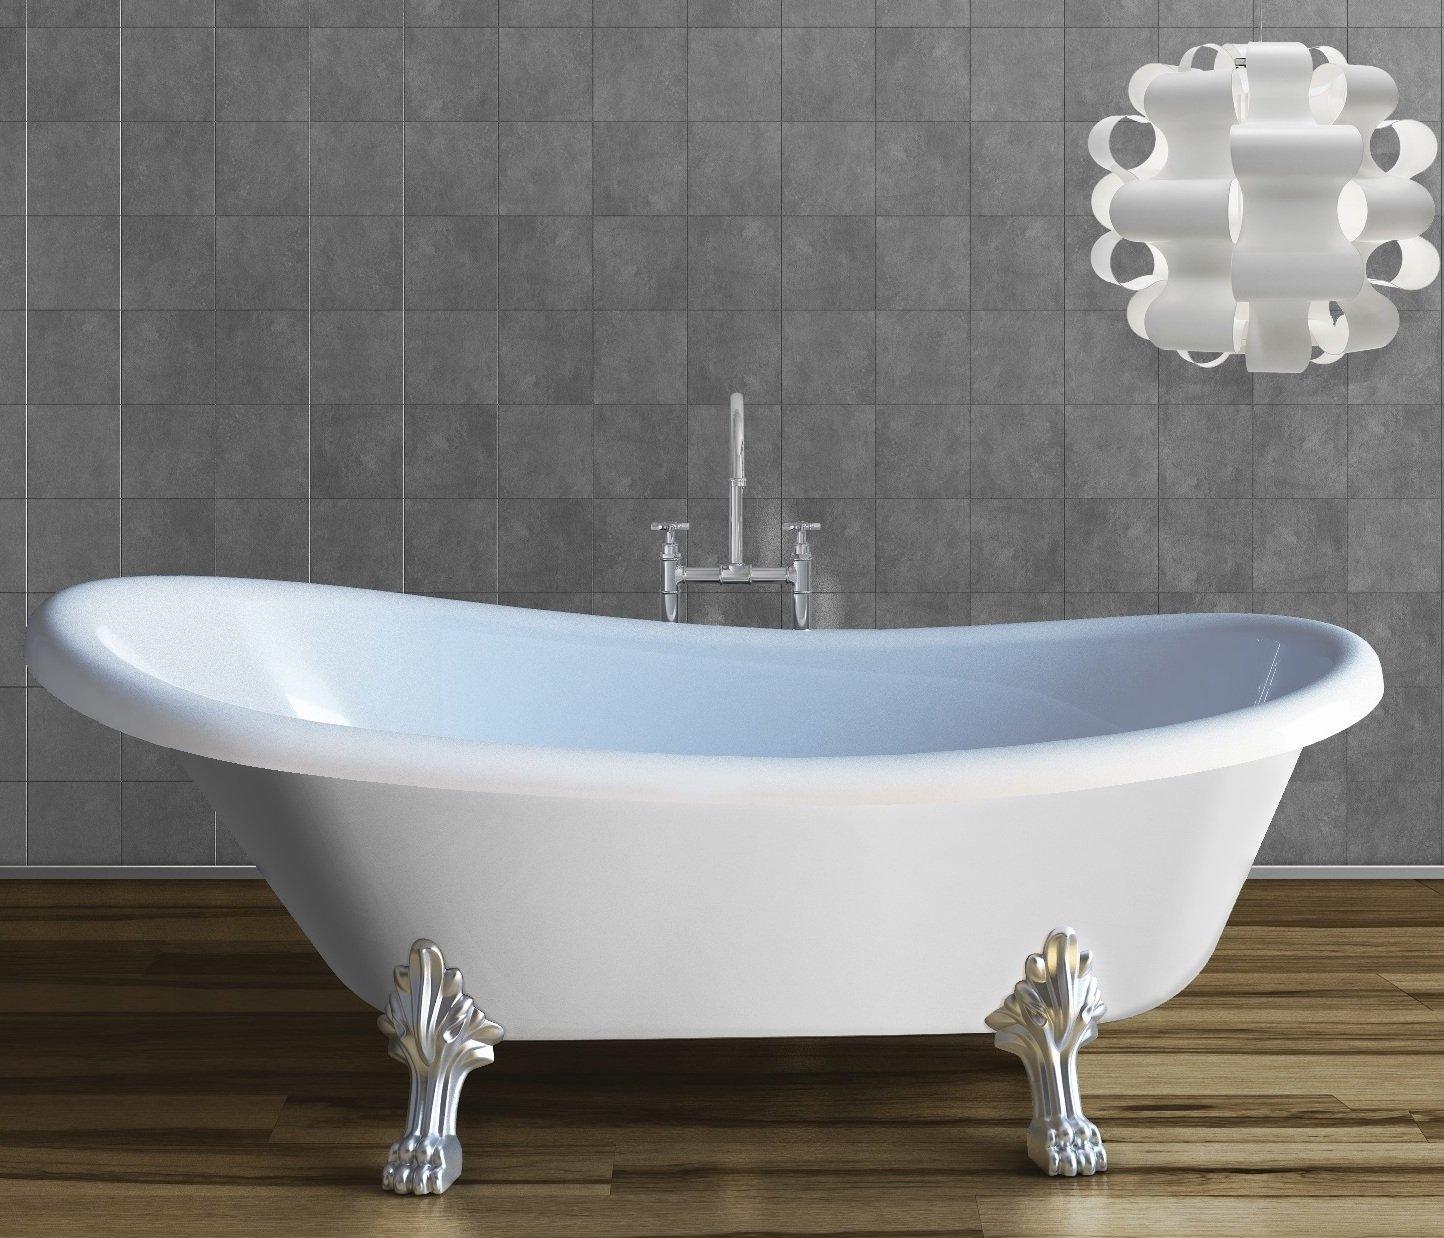 Vasca da bagno prezzi bassi latest rubinetto per la vasca - Costo vasca da bagno ...